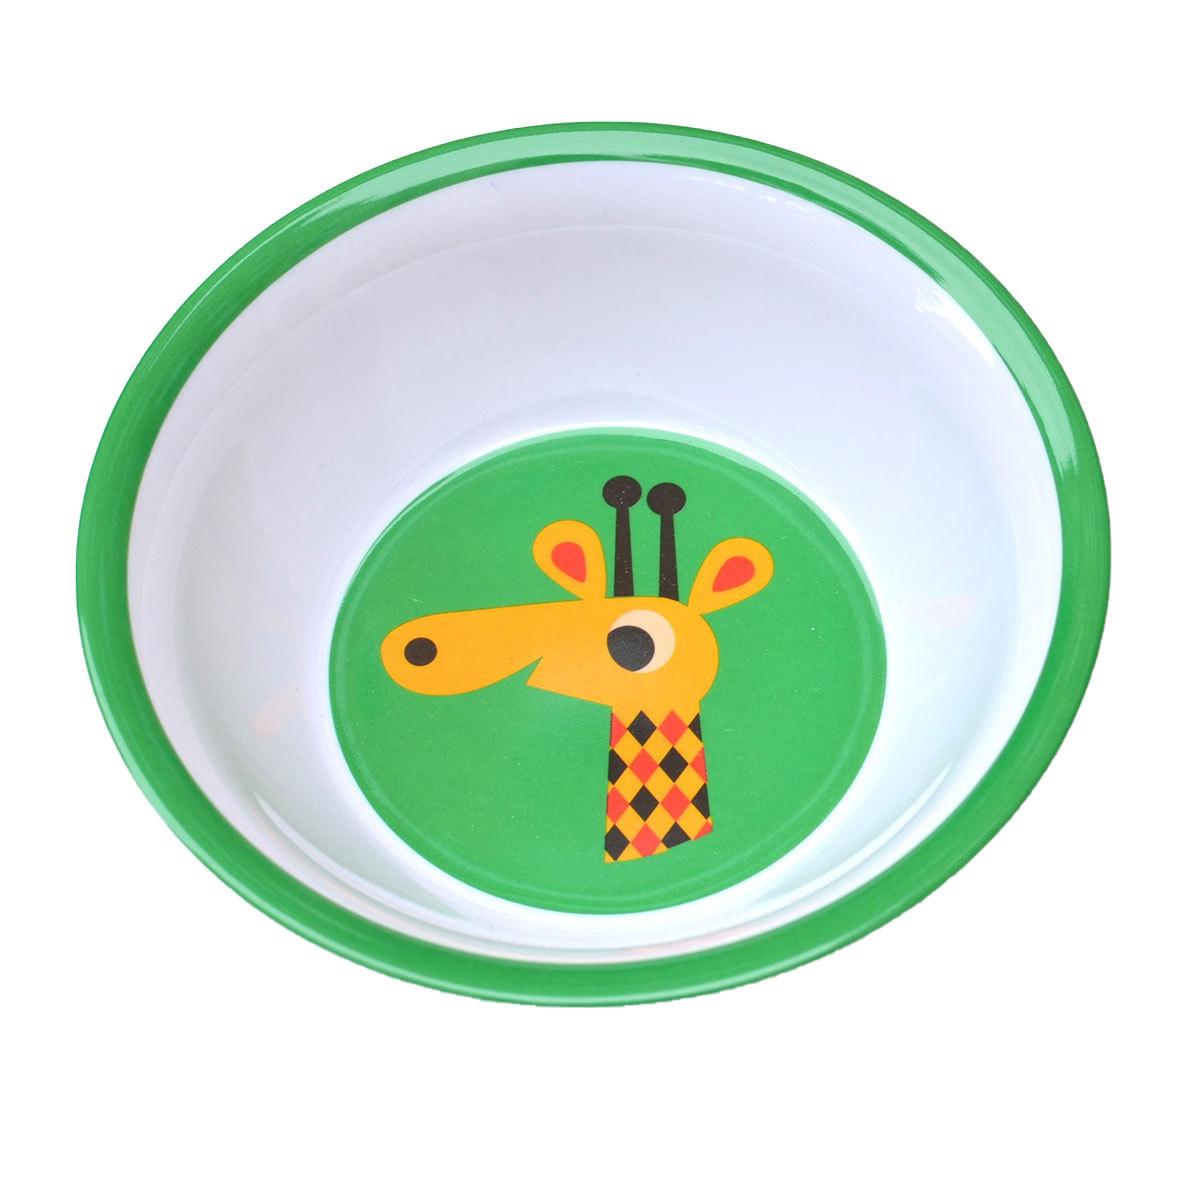 Vaisselle & Couvert Bol Girafe par Ingela P. Arrhenius Bol Girafe par Ingela P. Arrhenius